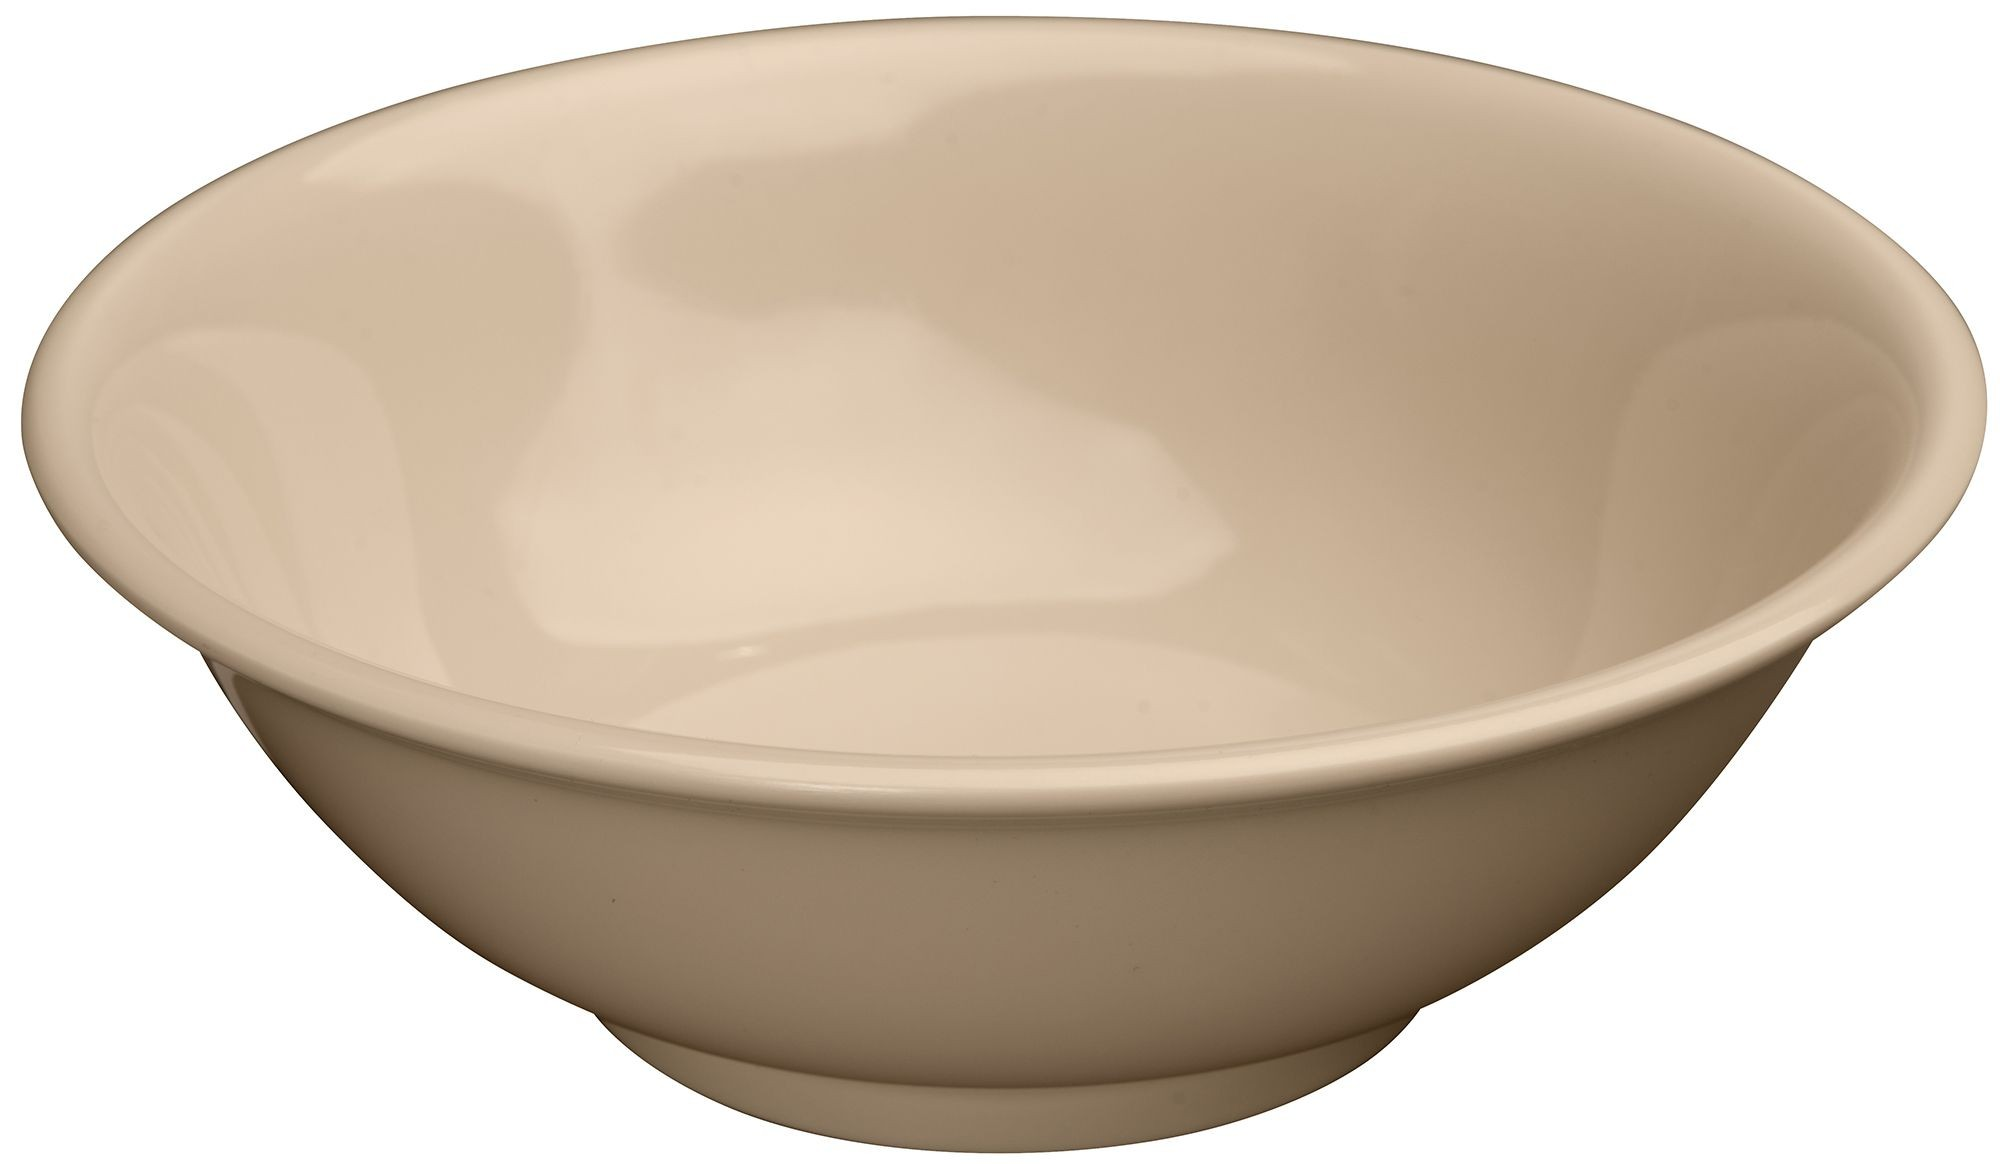 Winco MMB-96 Tan Melamine Rimless Bowl 96 oz.